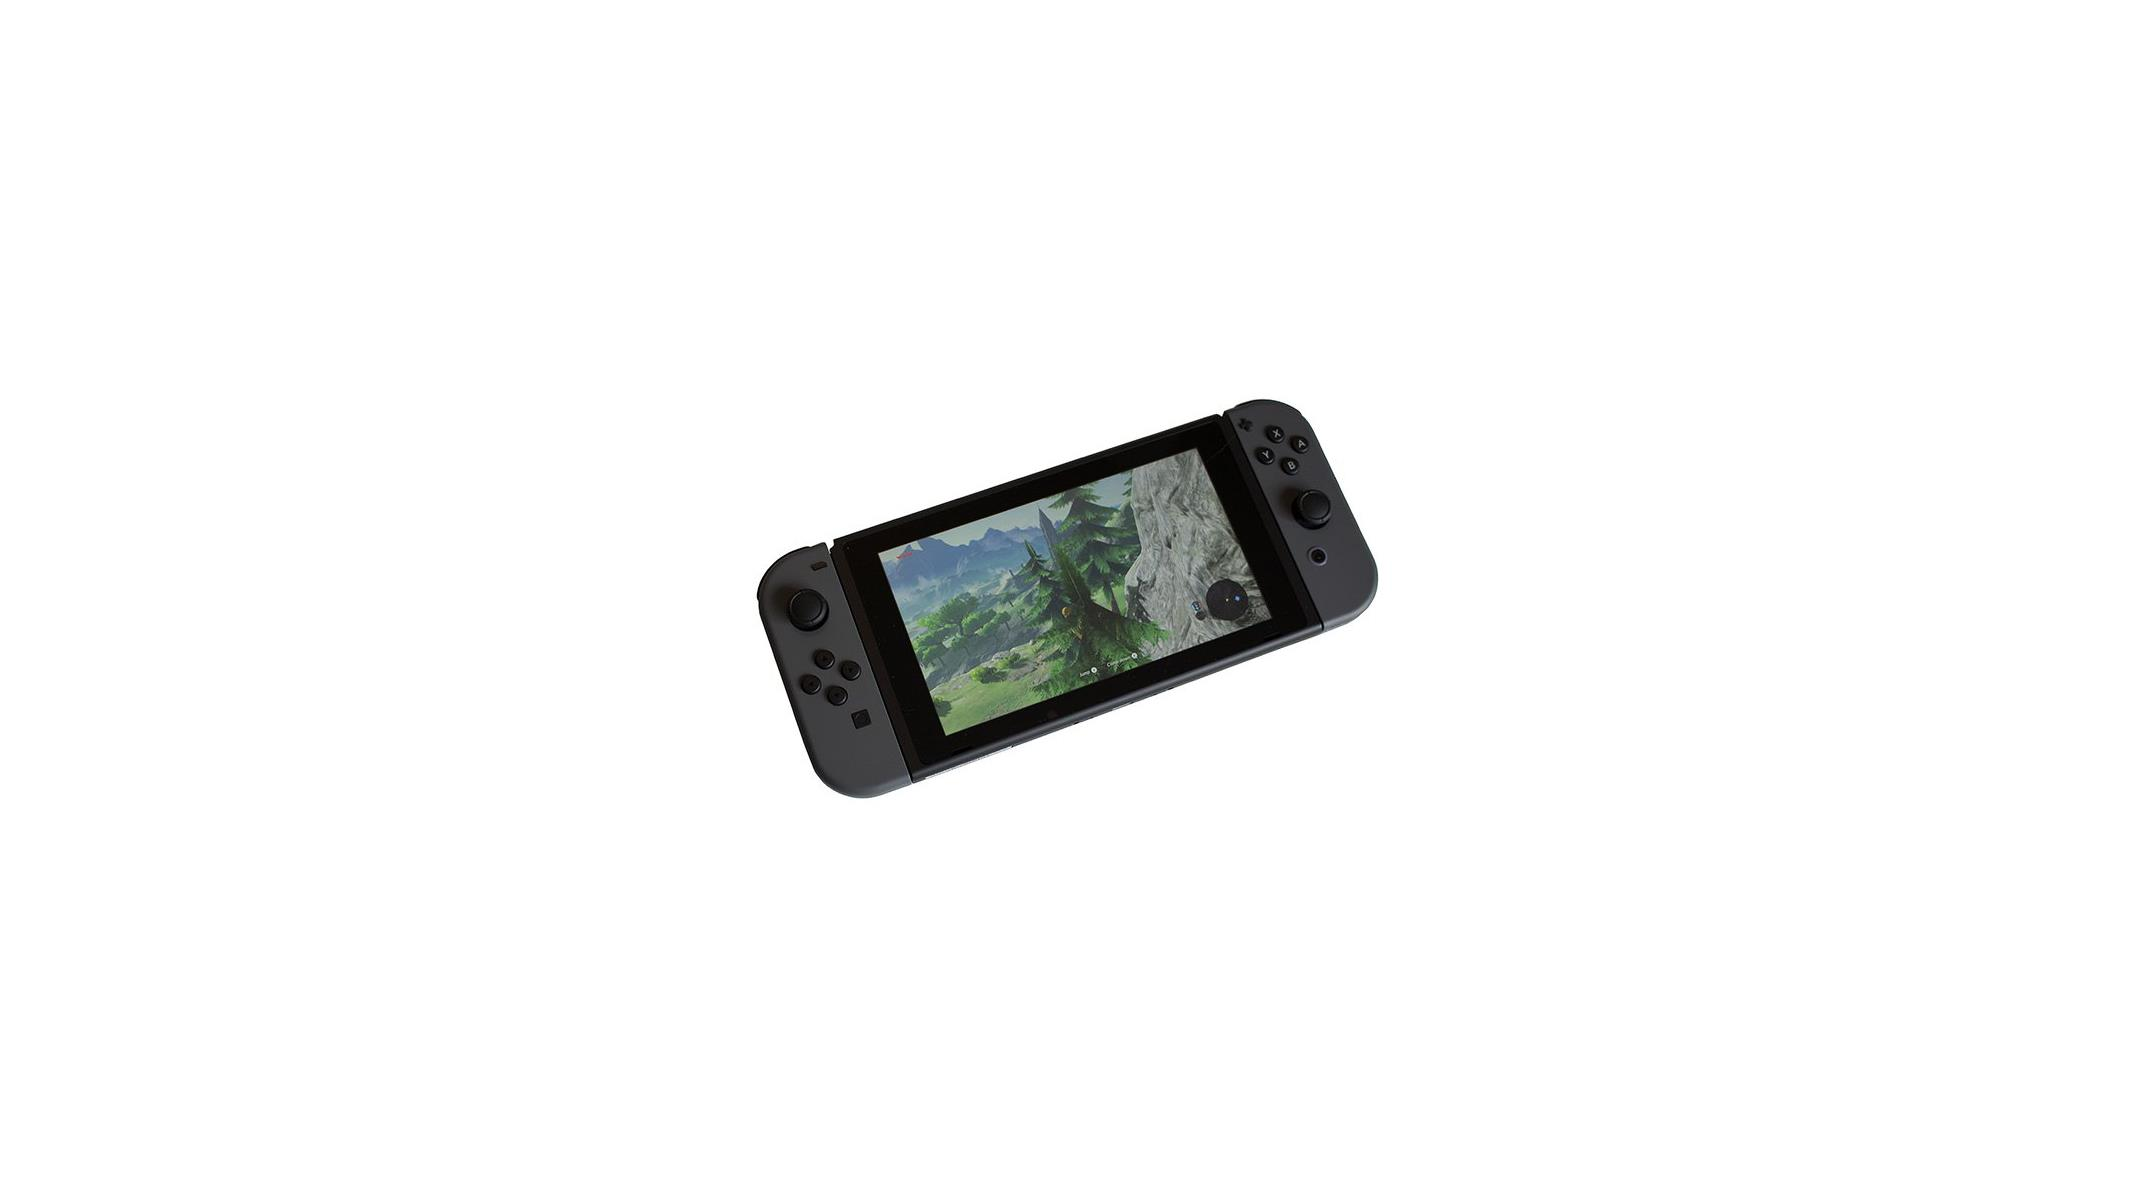 Nintendo Switch 'Yuzu' Emulator Announced By Citra 3DS